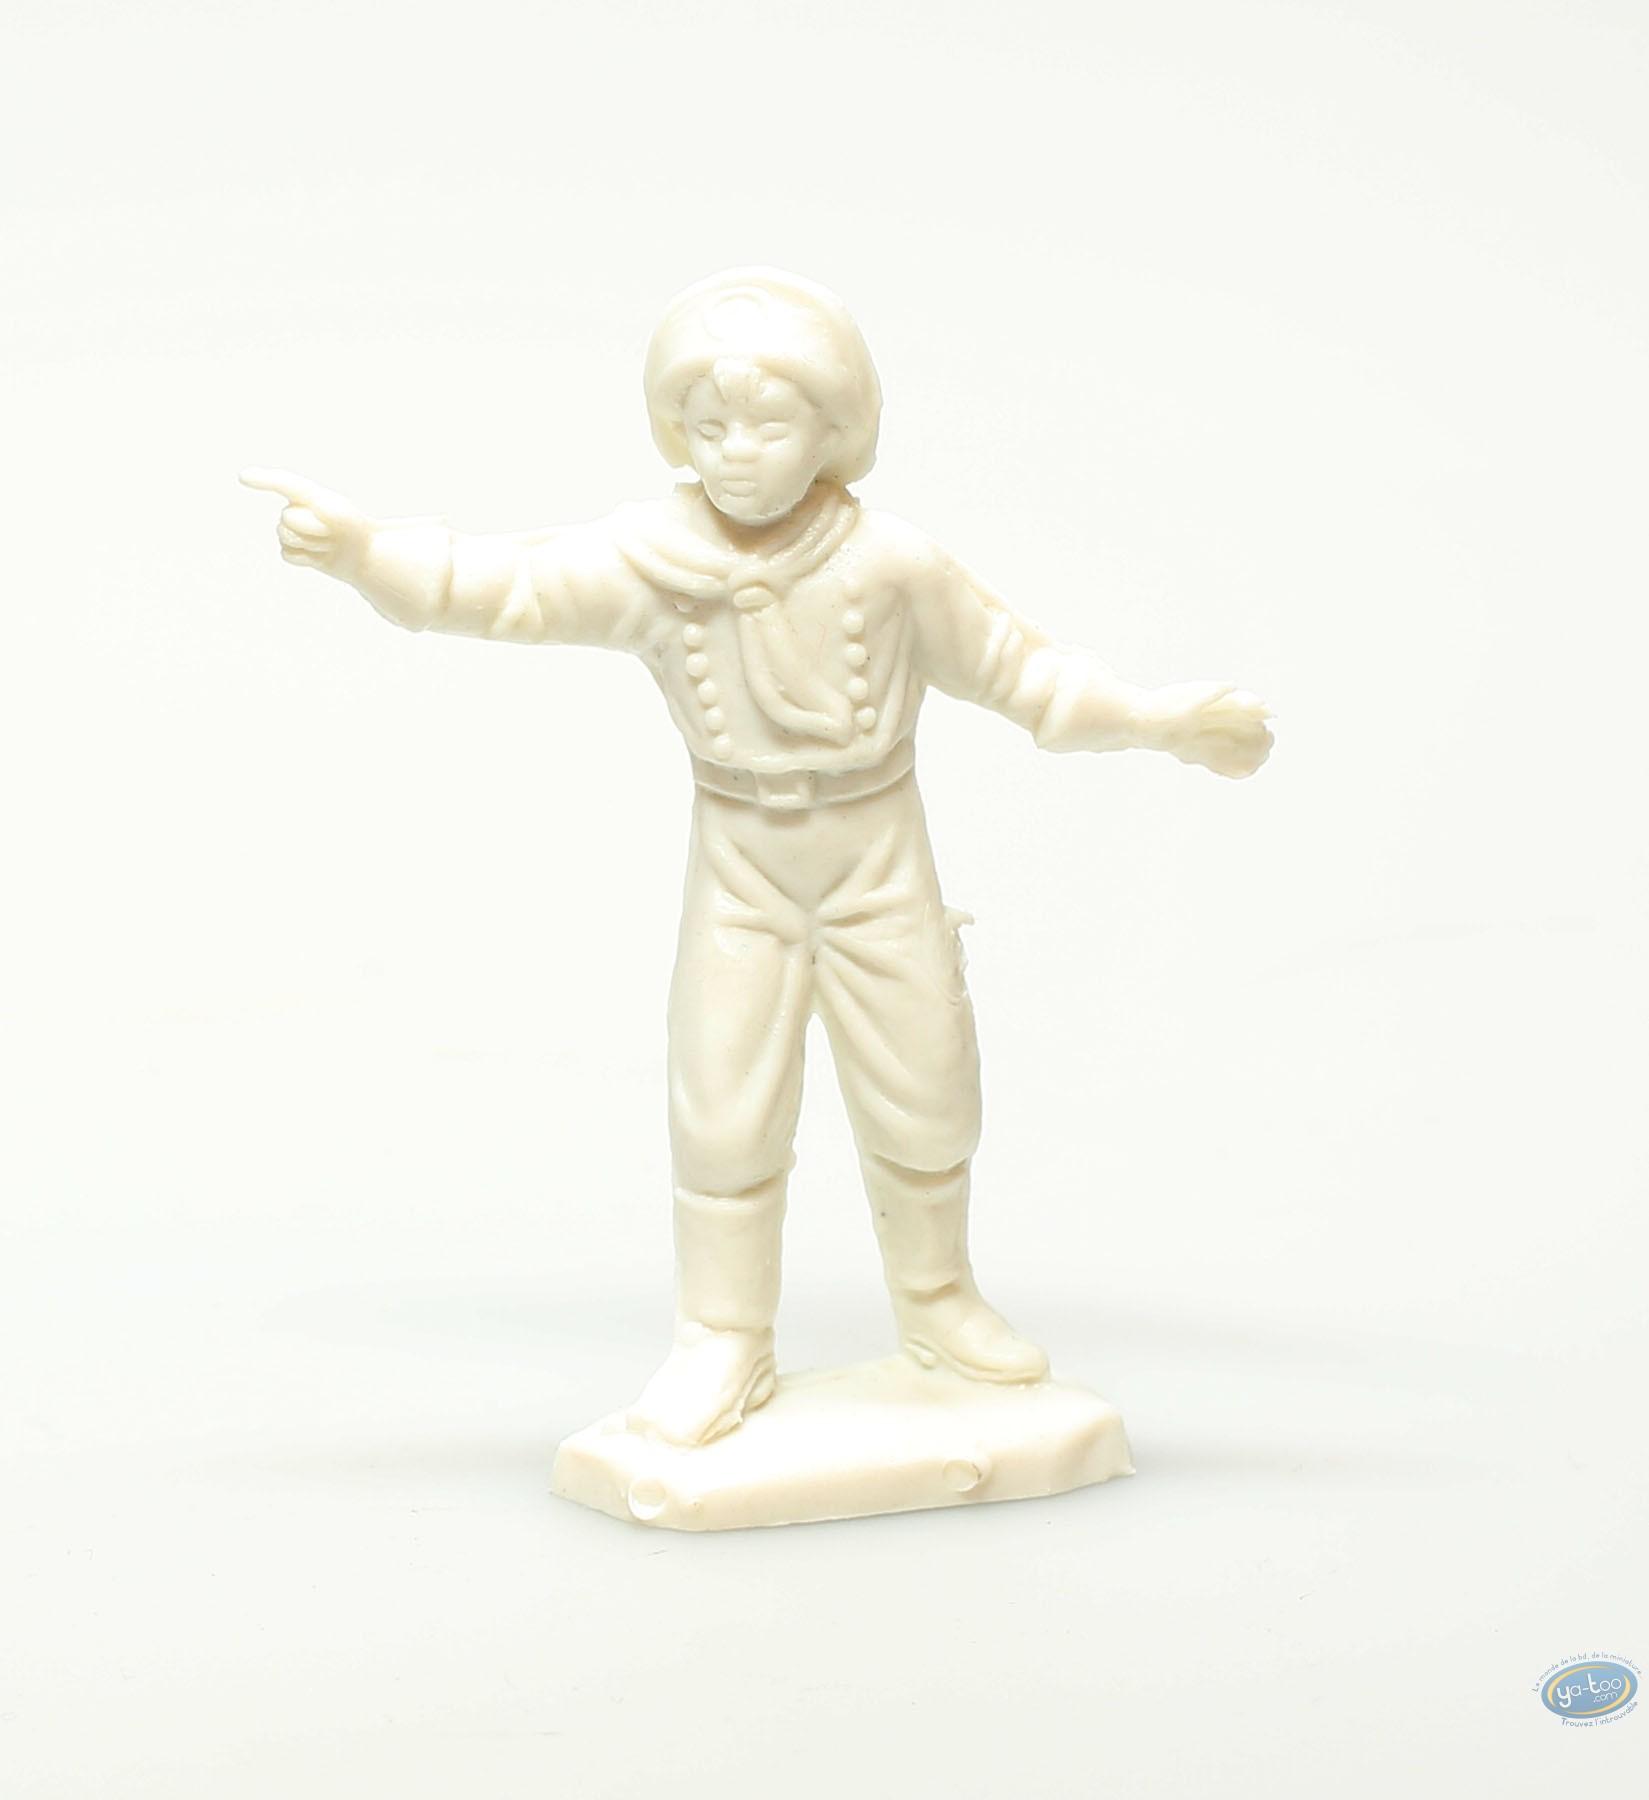 Plastic Figurine, Rintintin : Plastic figure : Young boy pointing white